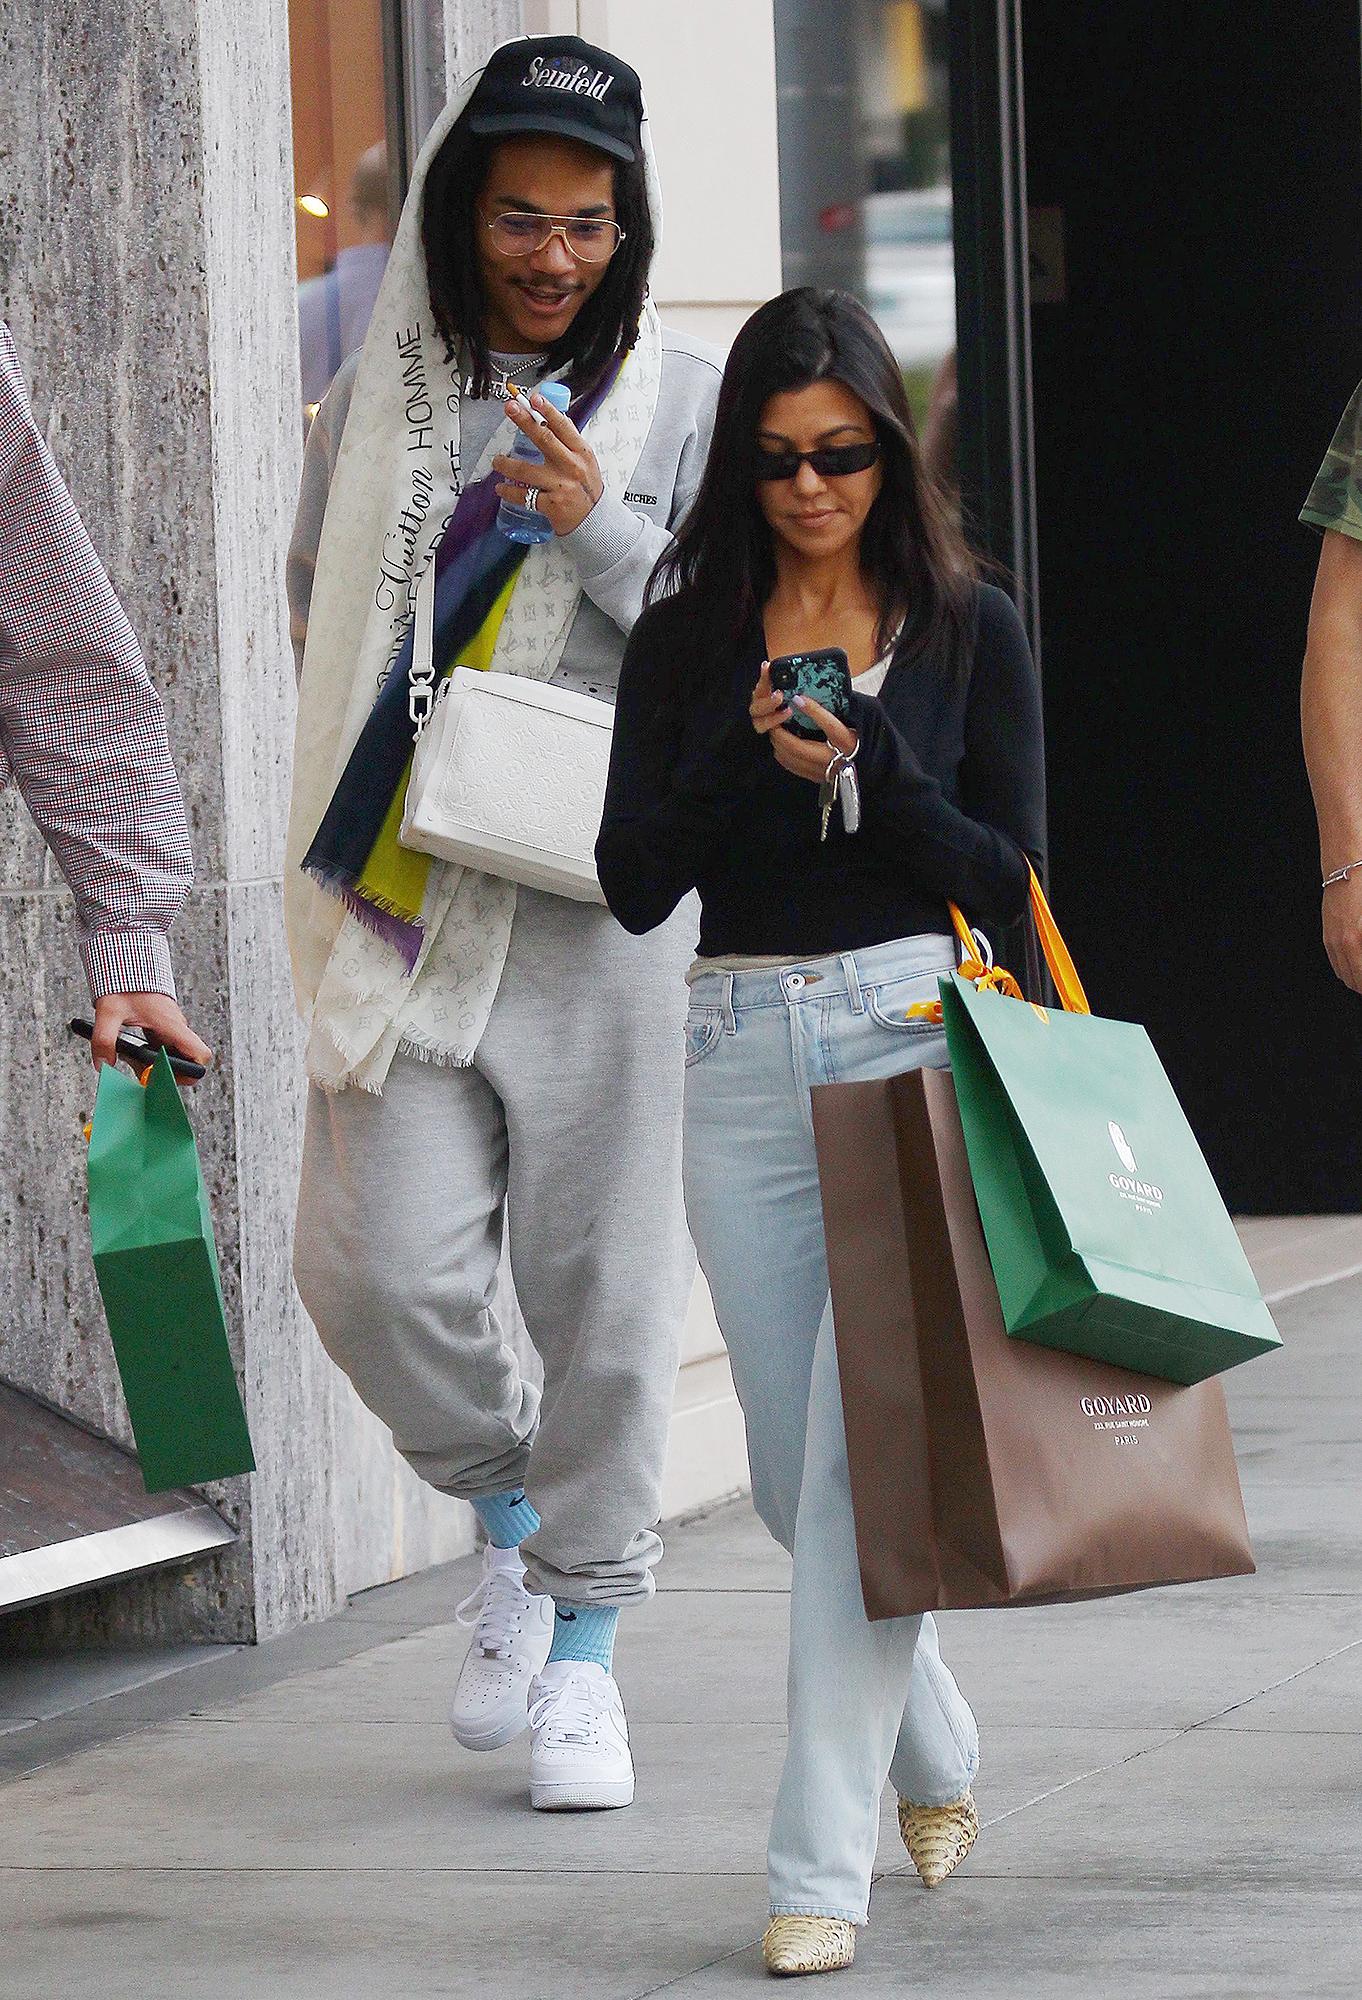 Kendall-Jenner-Gets-Close-to-Kourtney-Kardashian's-Ex-Luka-Sabbat